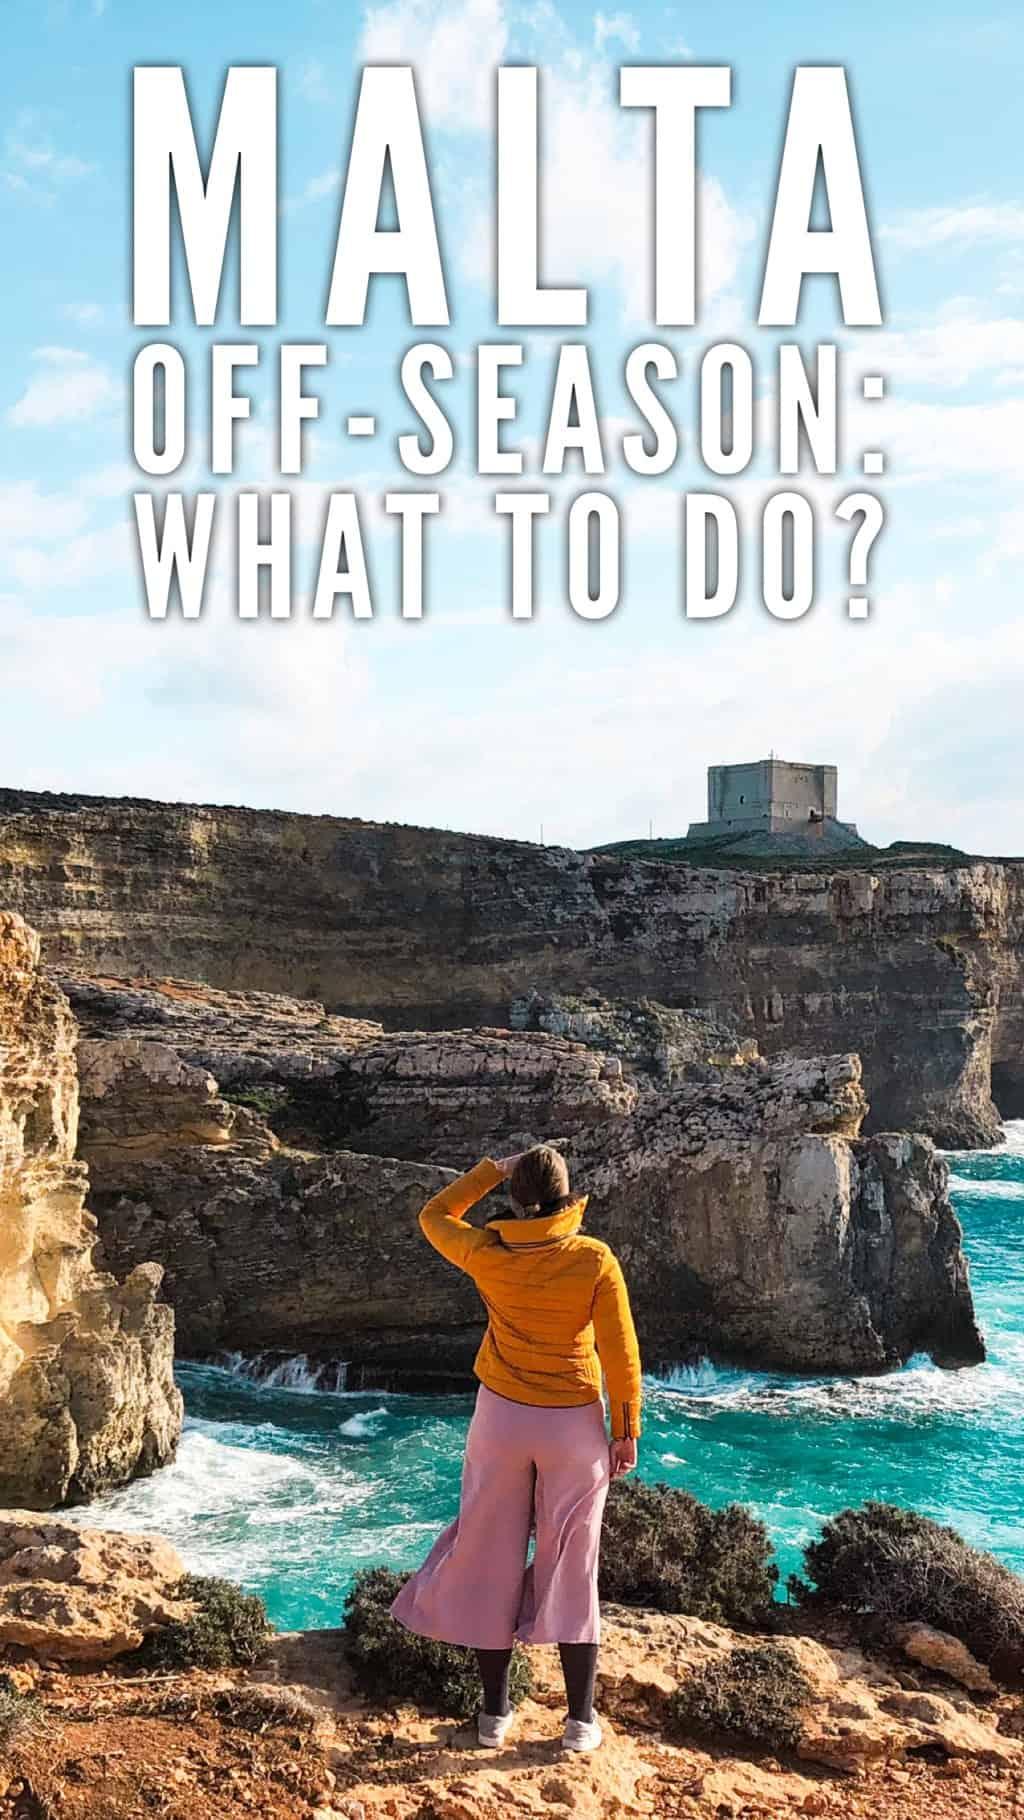 5 day itinerary for Malta in winter or spring. Christmas in Malta. Low season in Malta, Malta off-season